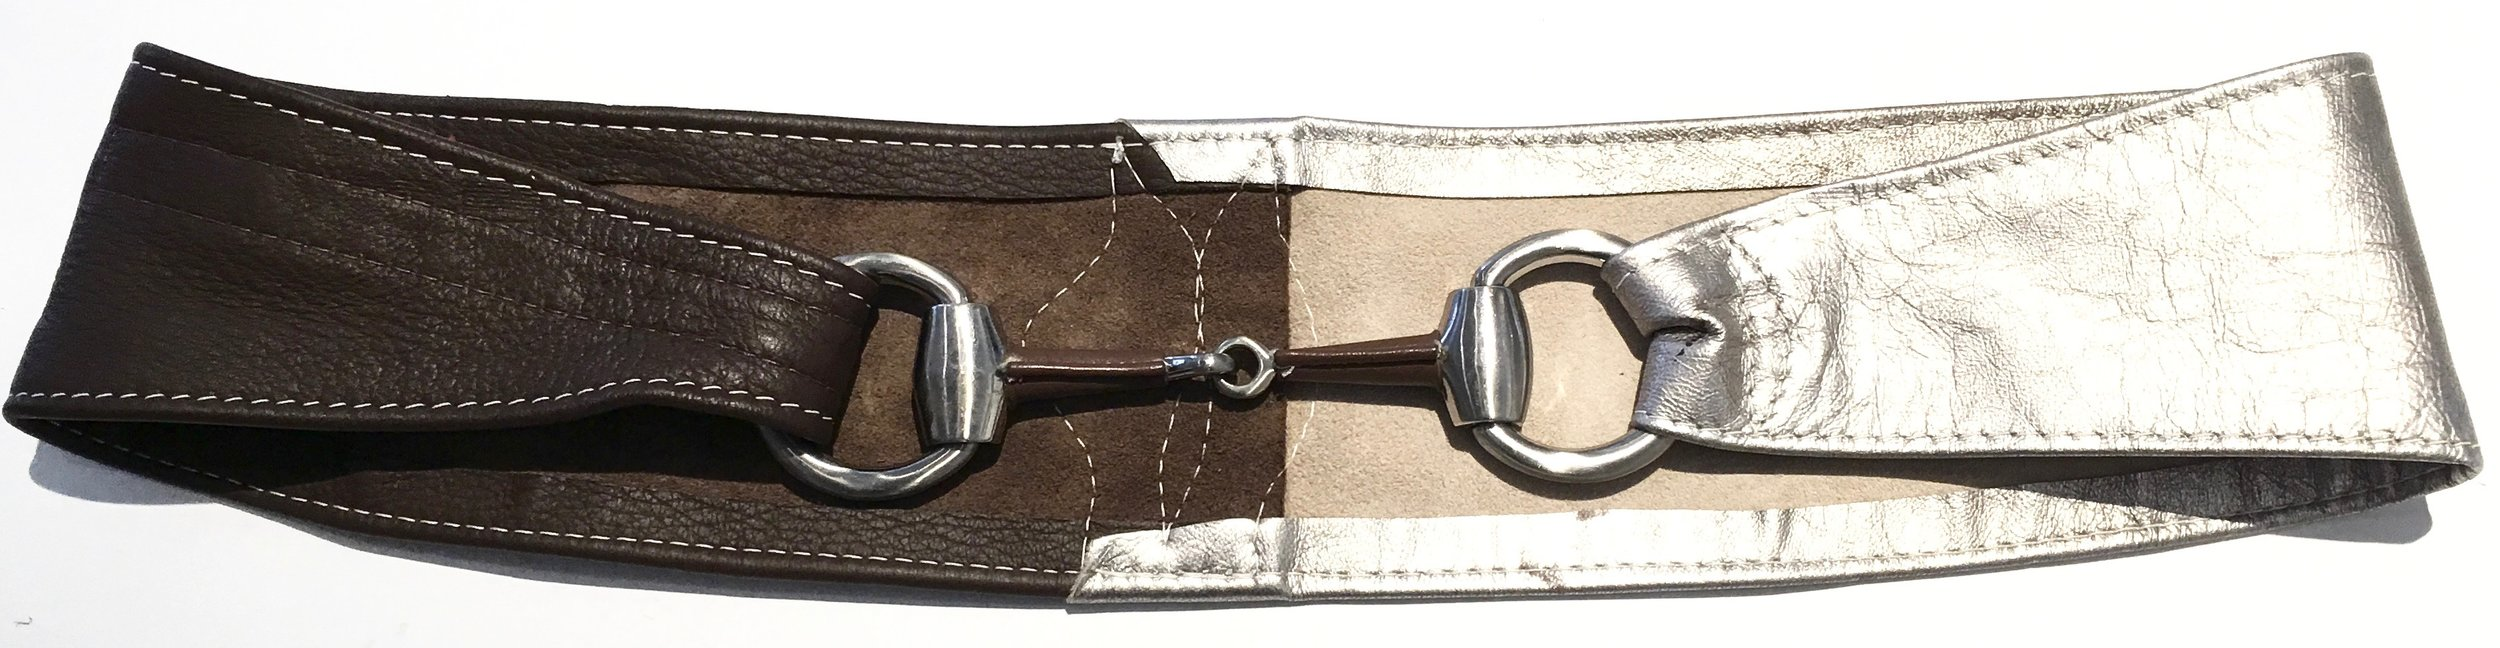 Brown deerskin and silver metallic lambkin HipWear.  One of a kind horse bit design and adjustable velcro closure. $278. (1).jpg